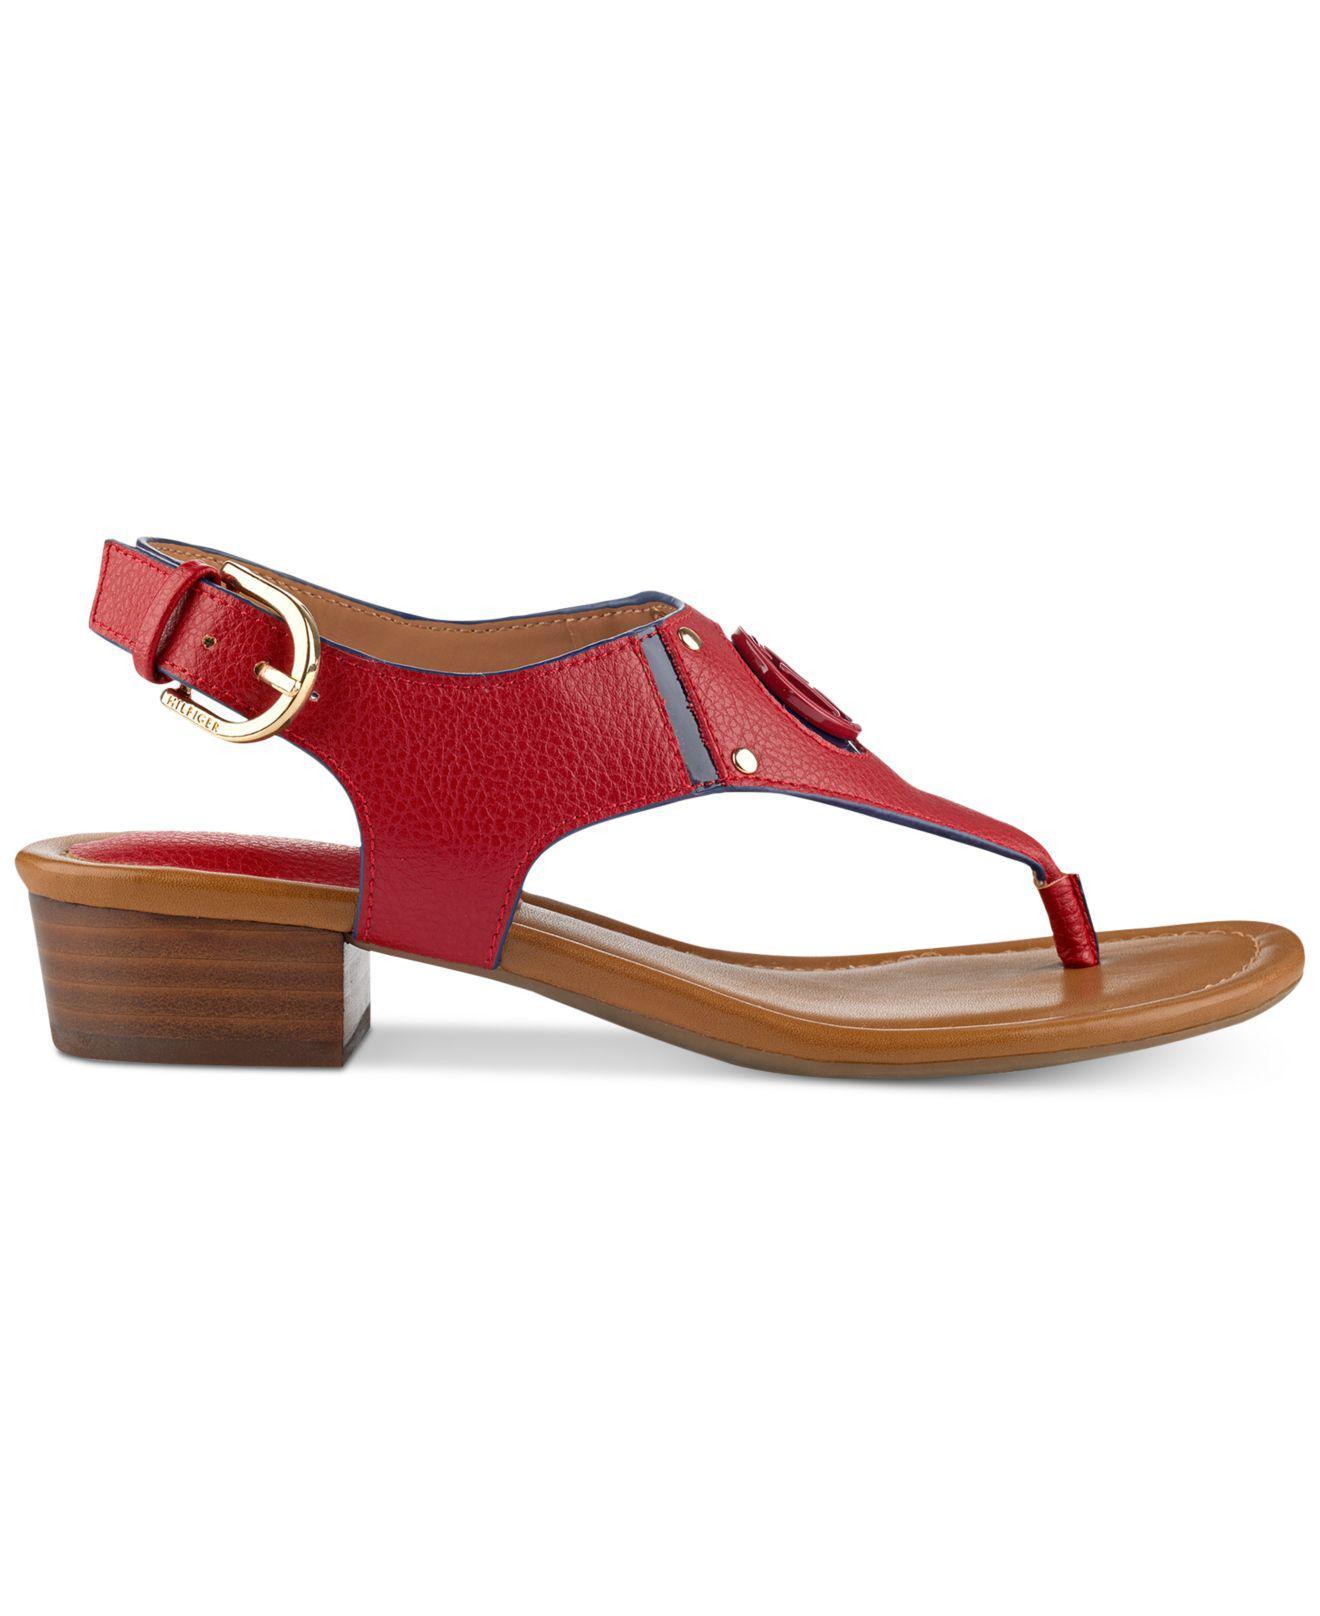 Lyst Tommy Hilfiger Kissi Block Heel Sandals In Red